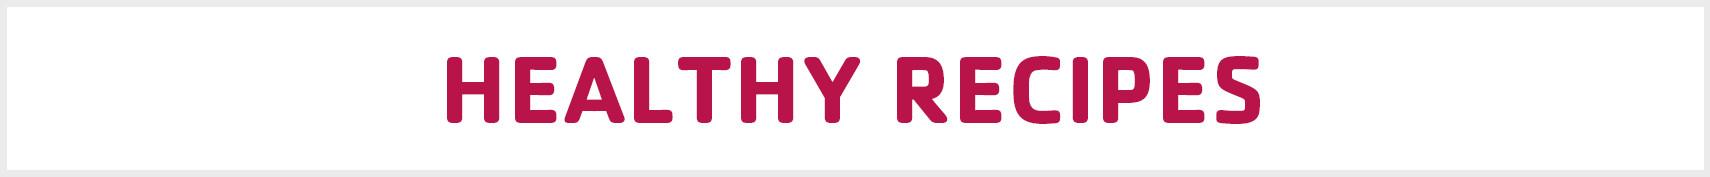 Healthy Recipe listing page header banner.jpg